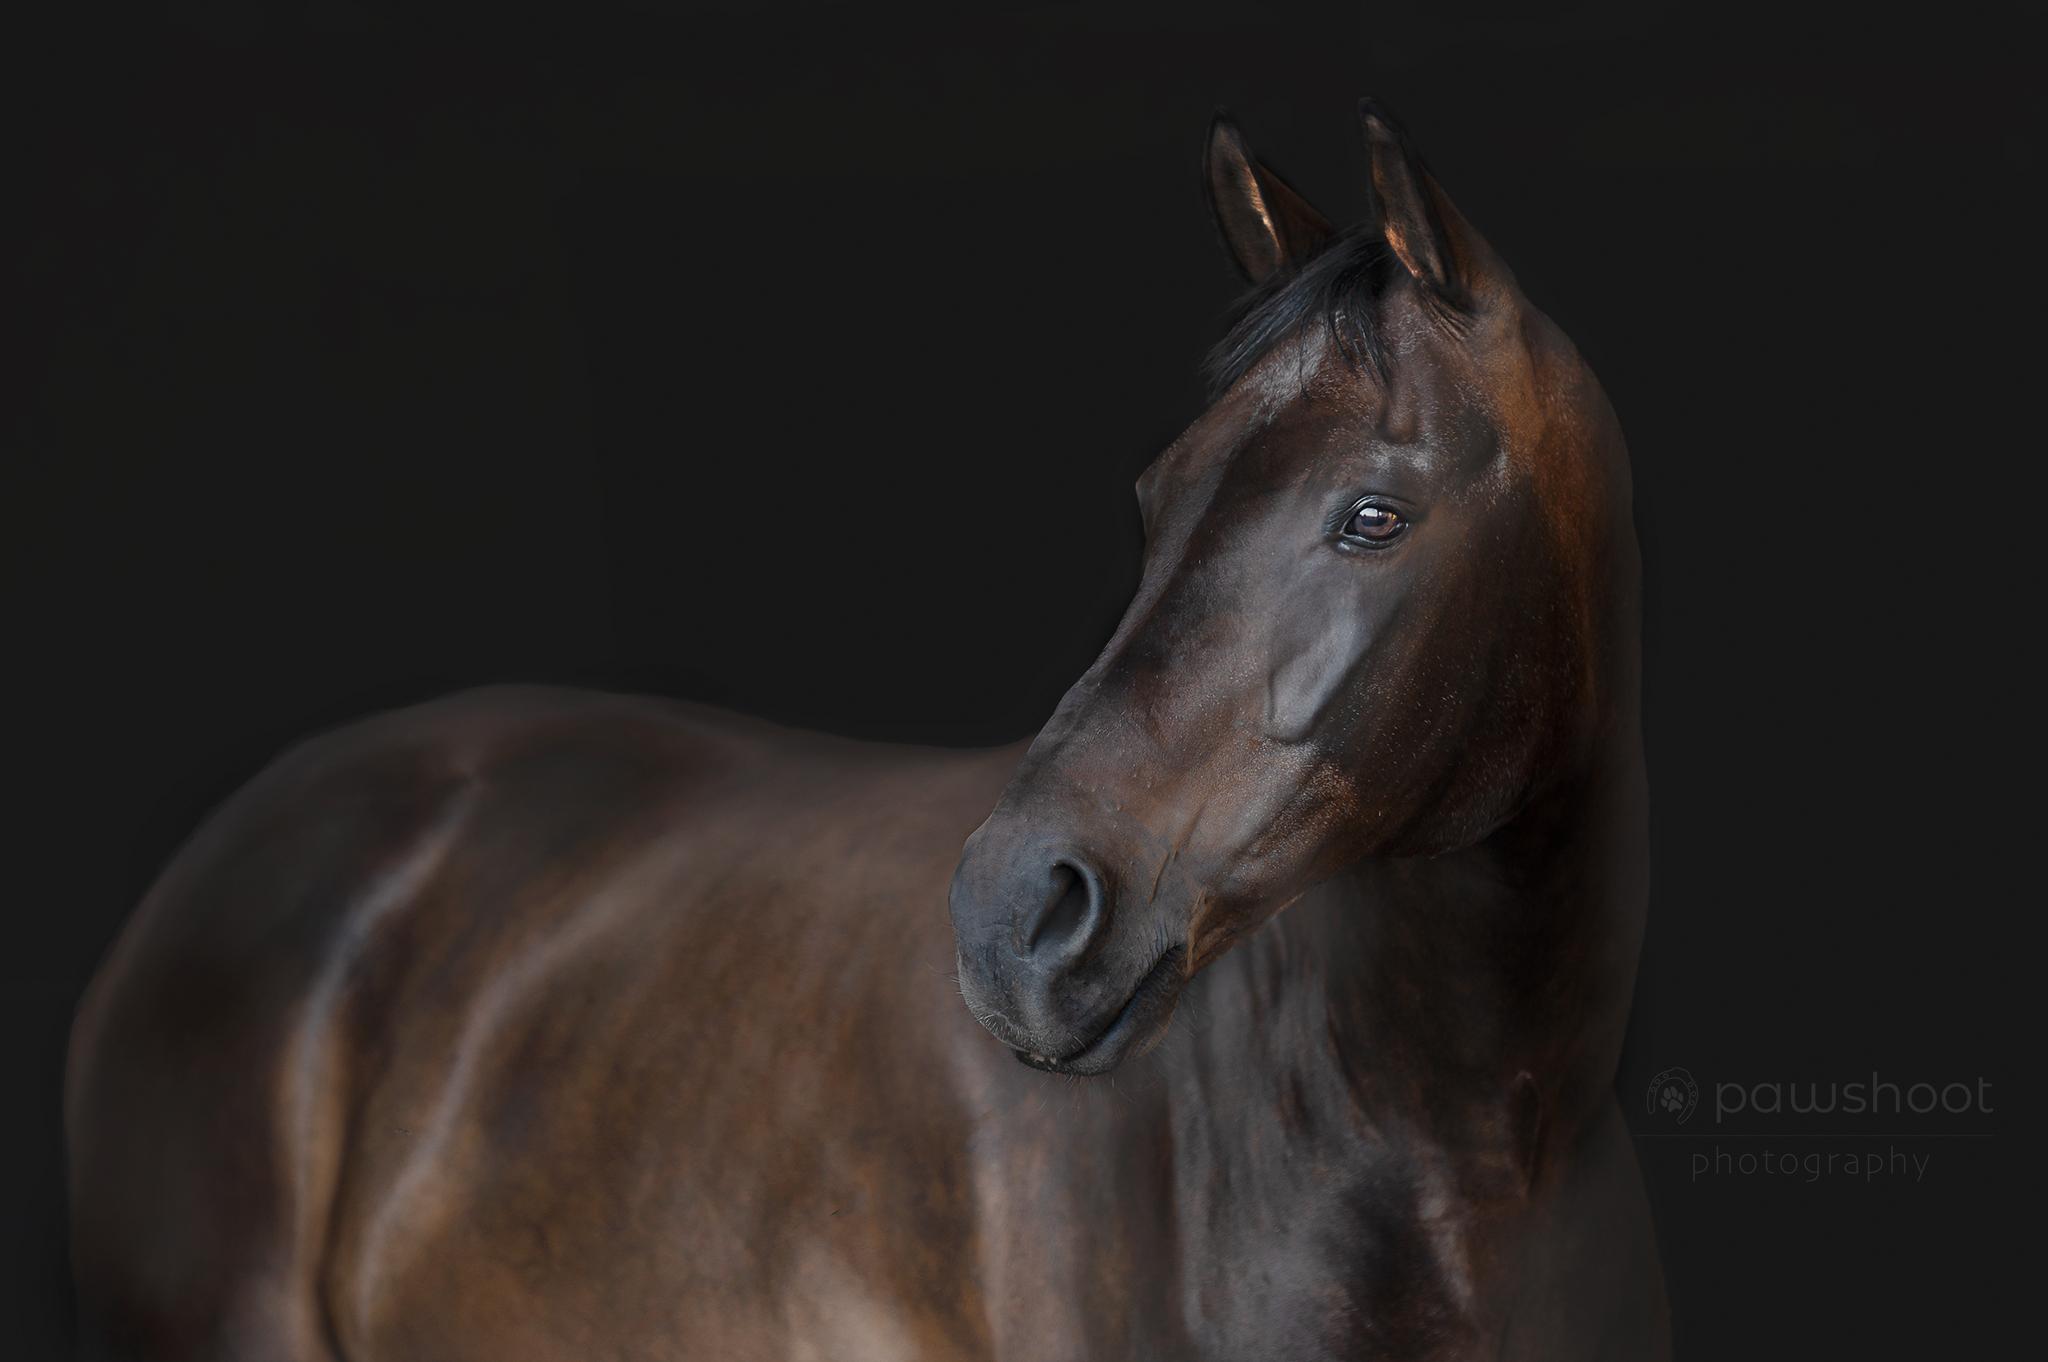 Paard blackshoot portfolio Pawshoot hondenfotografie